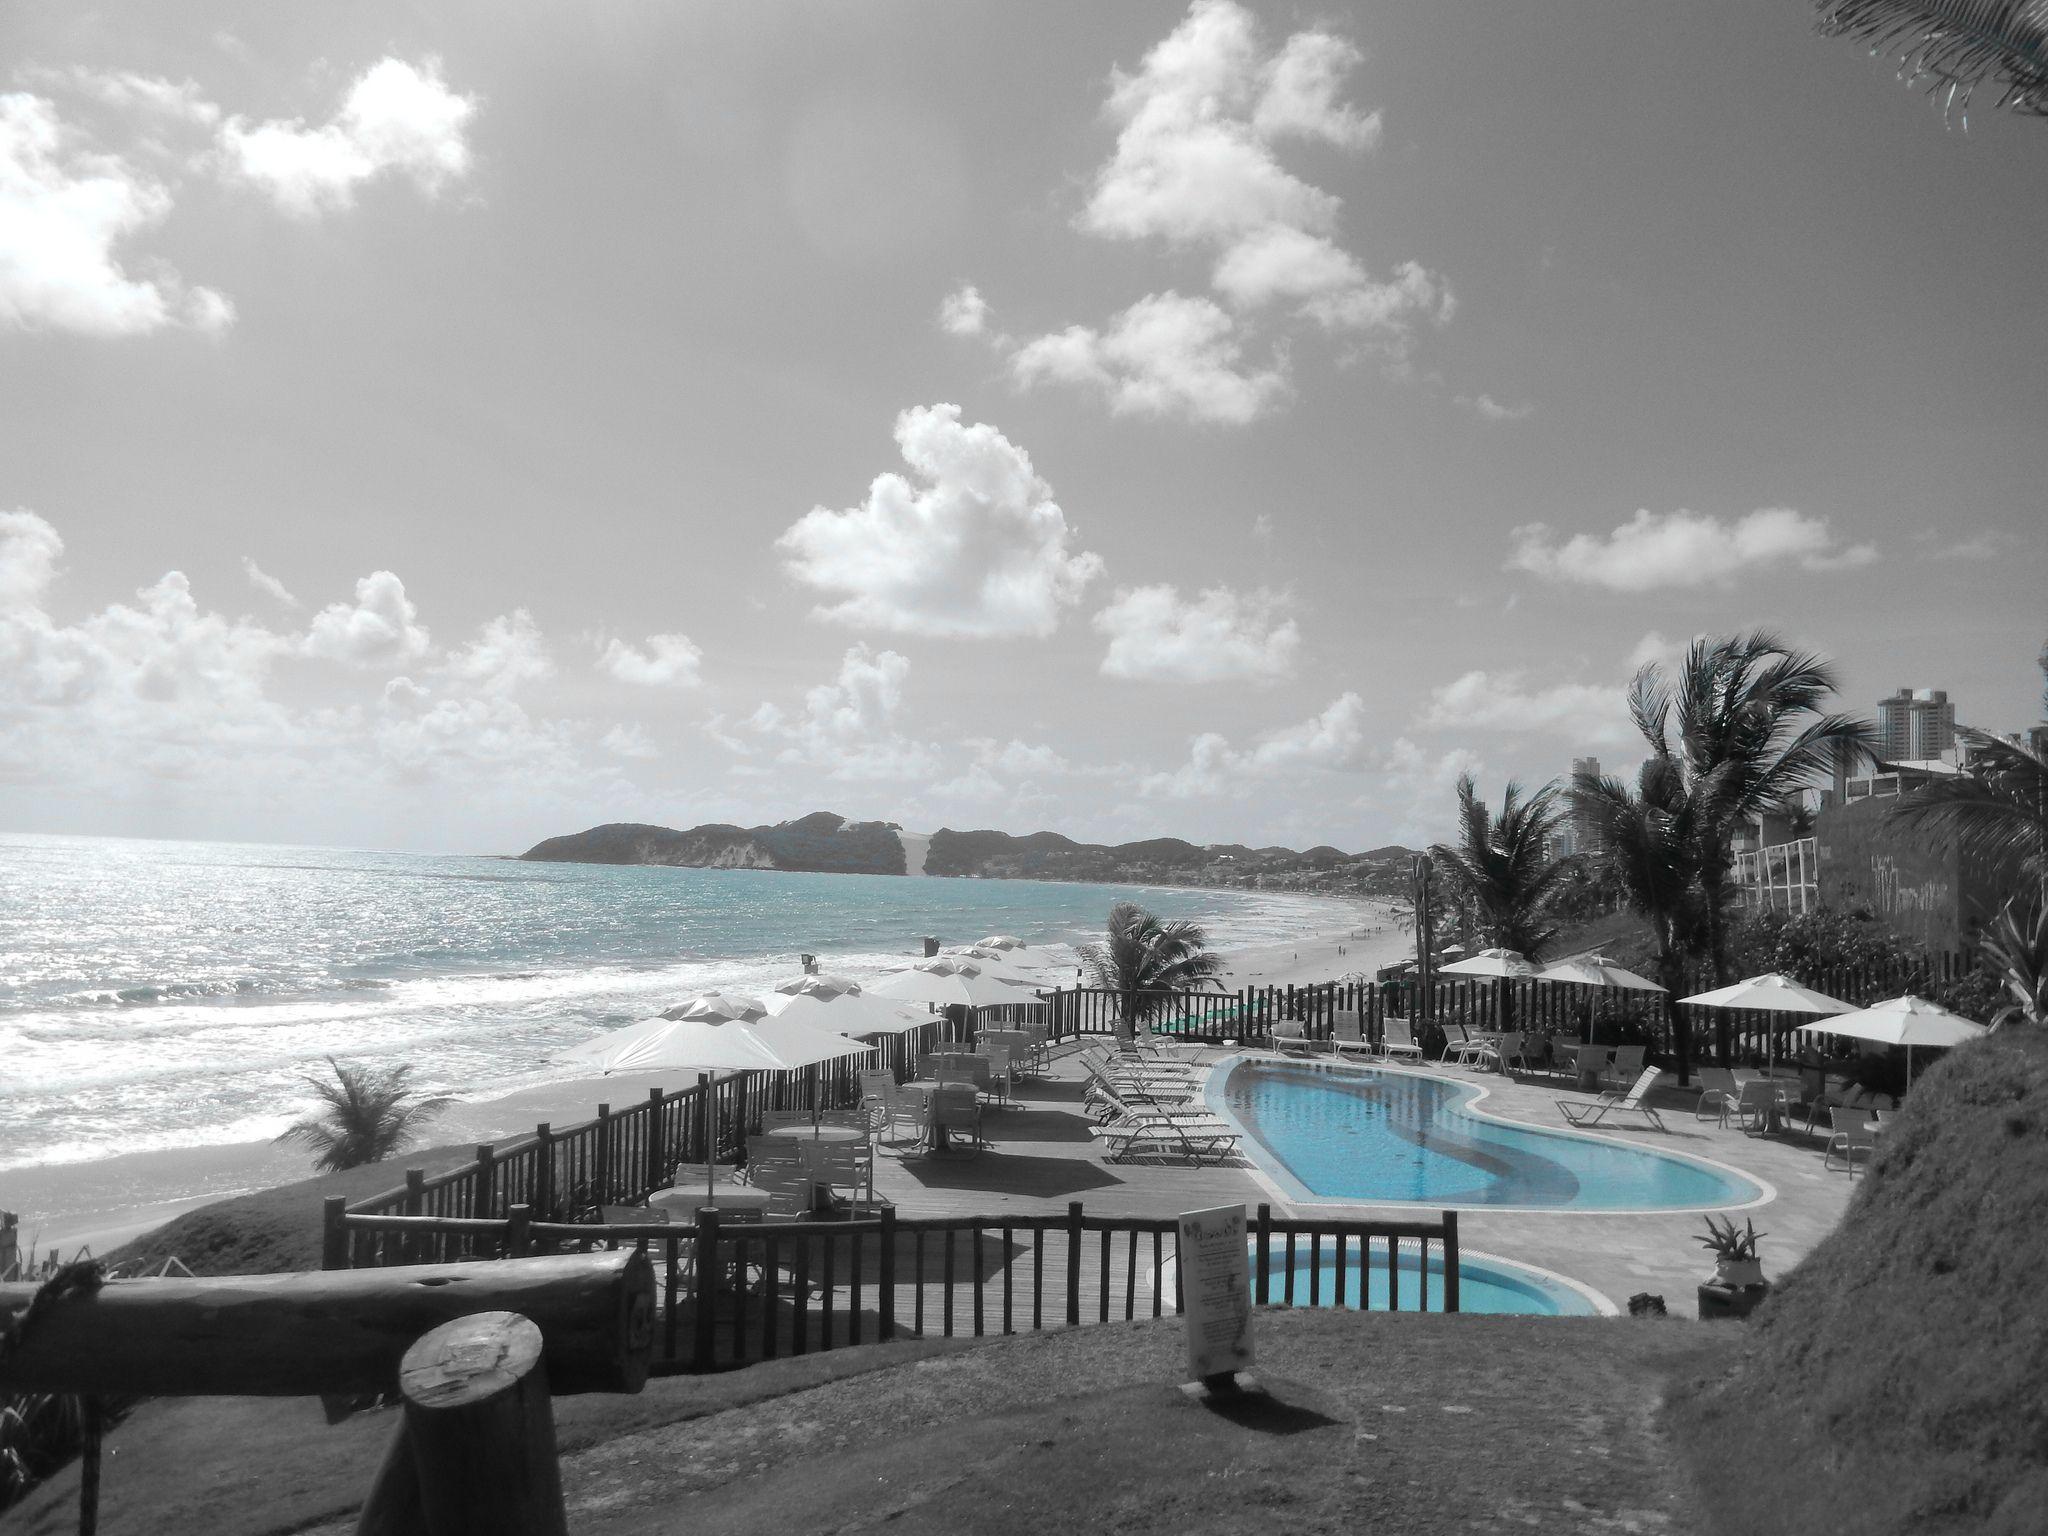 Piso 3 Rifoles Praia Hotel Ponta Negra Outdoor Outdoor Decor Pool